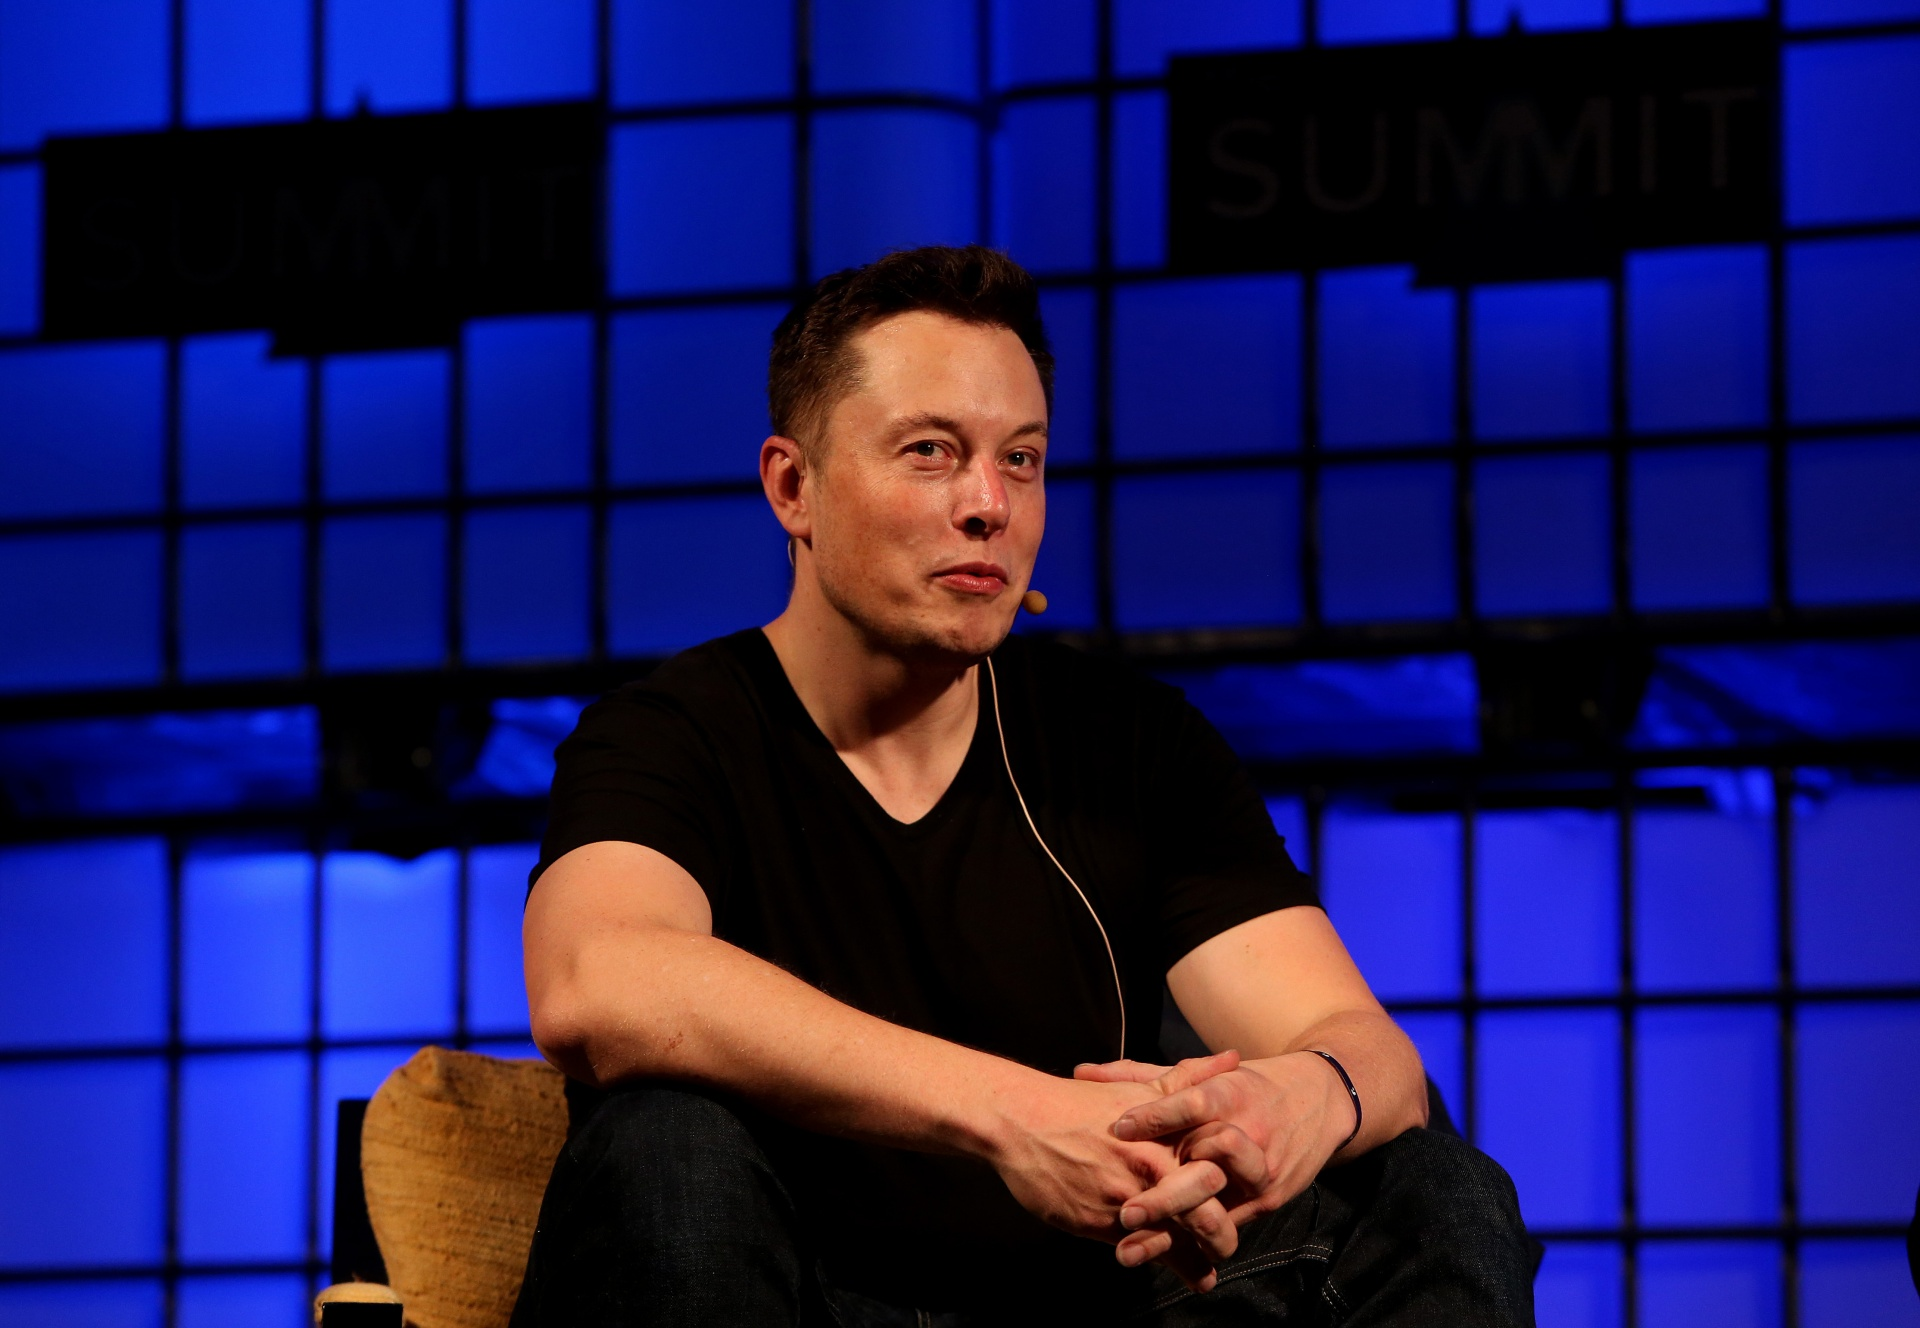 Looney billionaire Elon Musk at the Dublin web summit in October